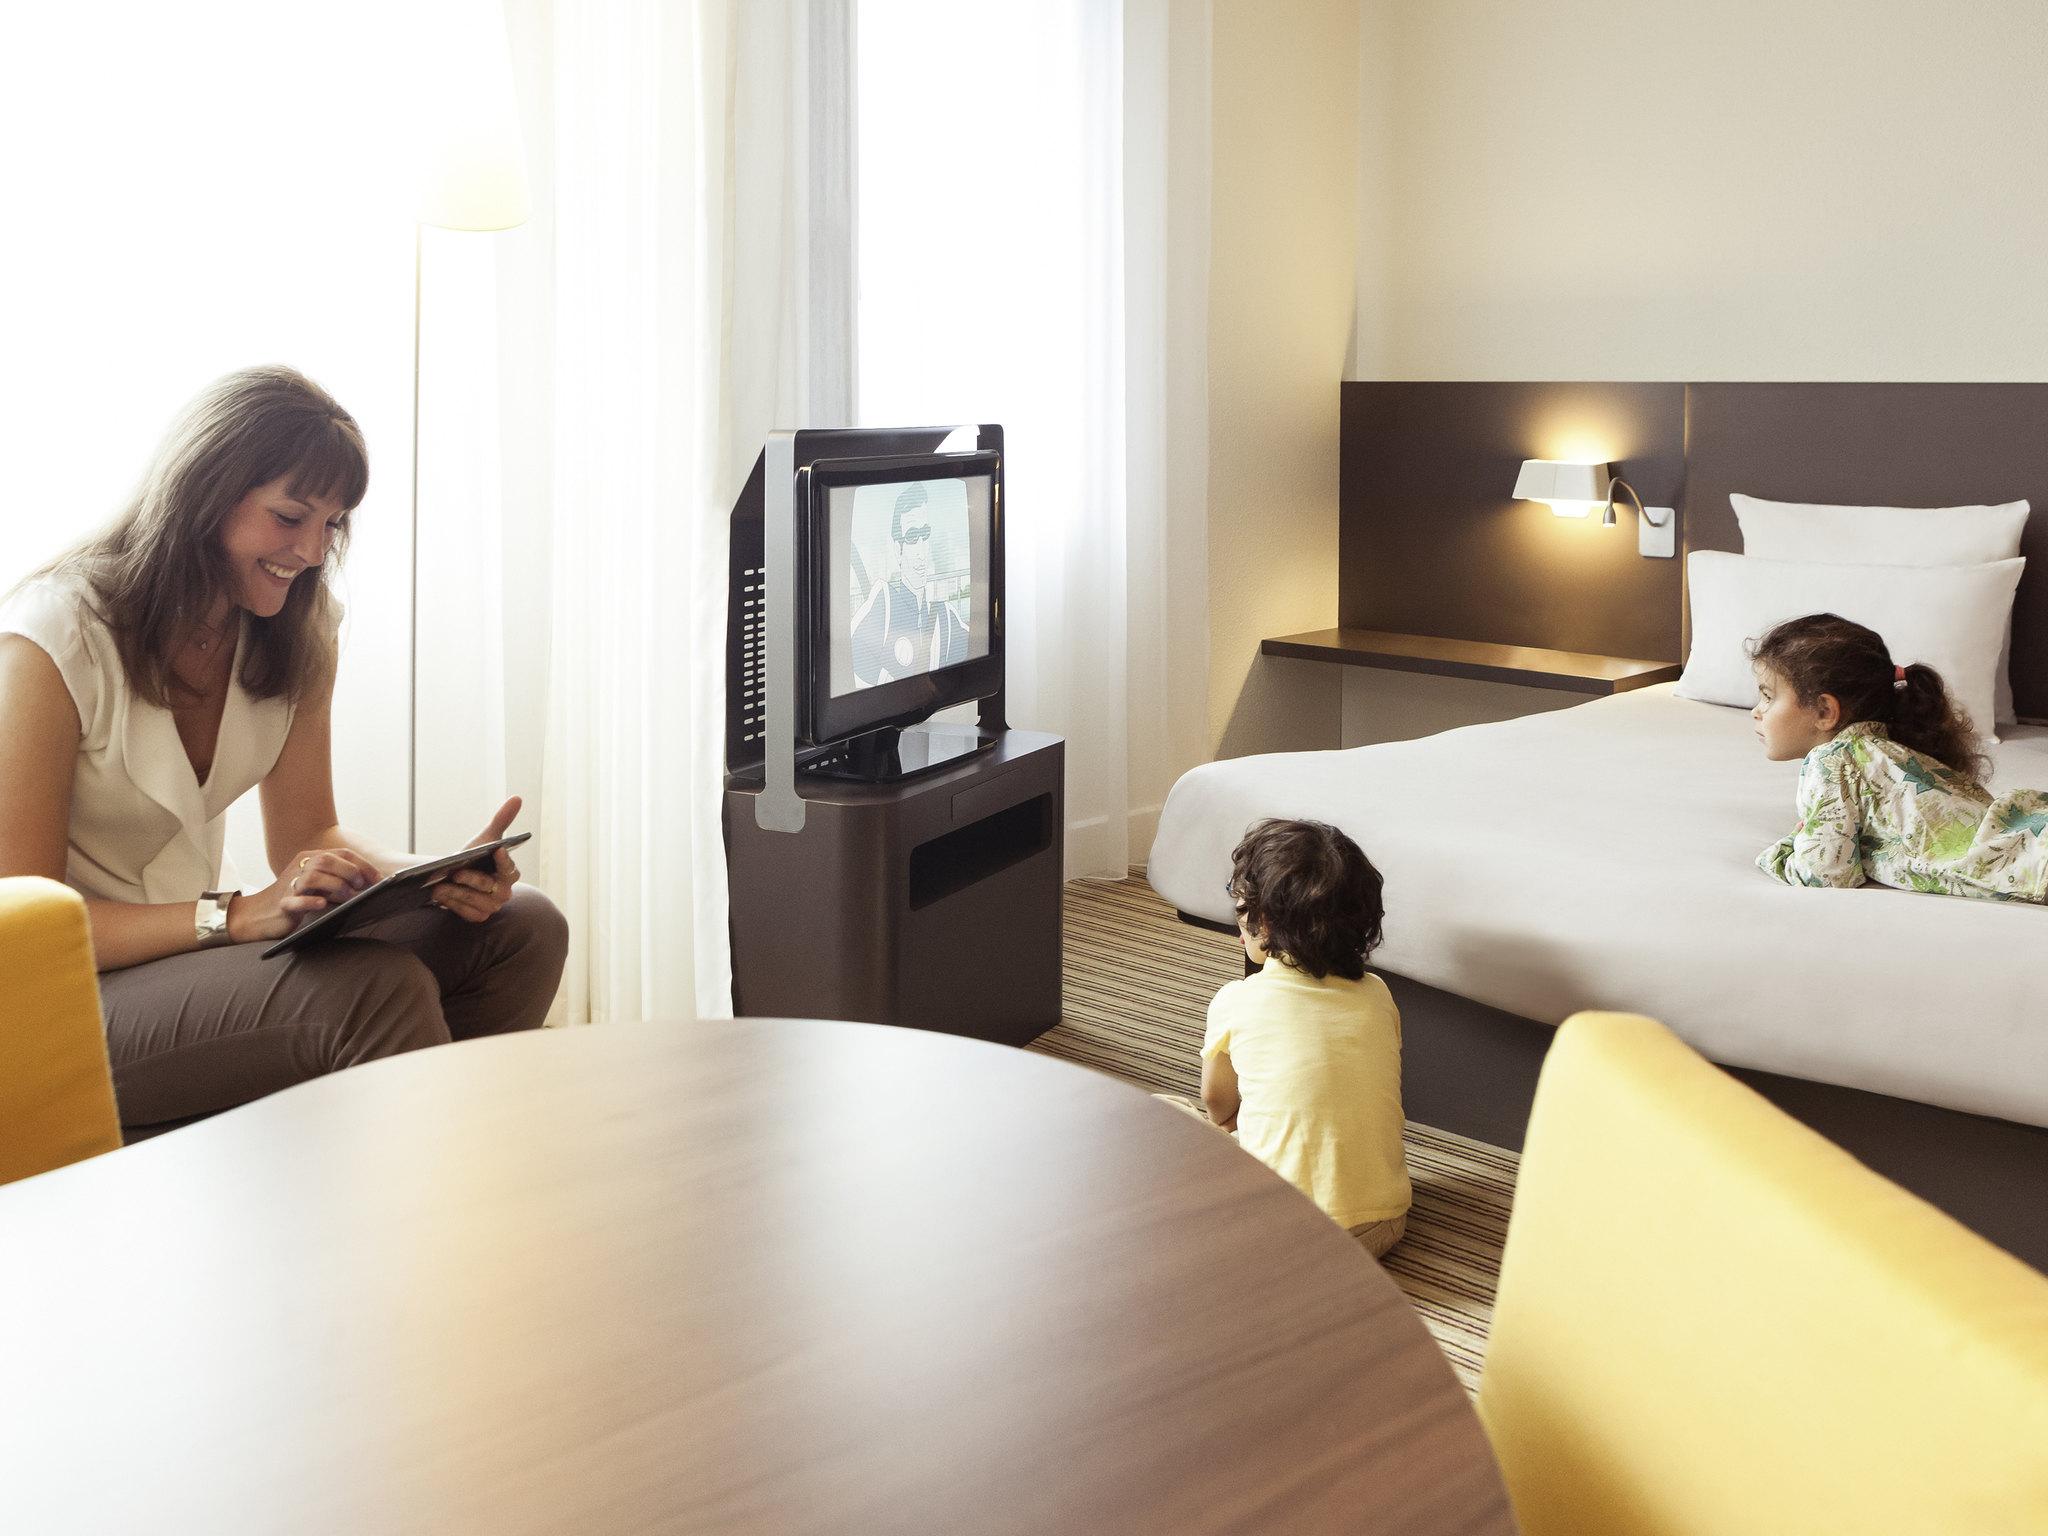 Hotel in VELIZY VILLACOUBLAY - Novotel Suites Paris Velizy 611eea18d987